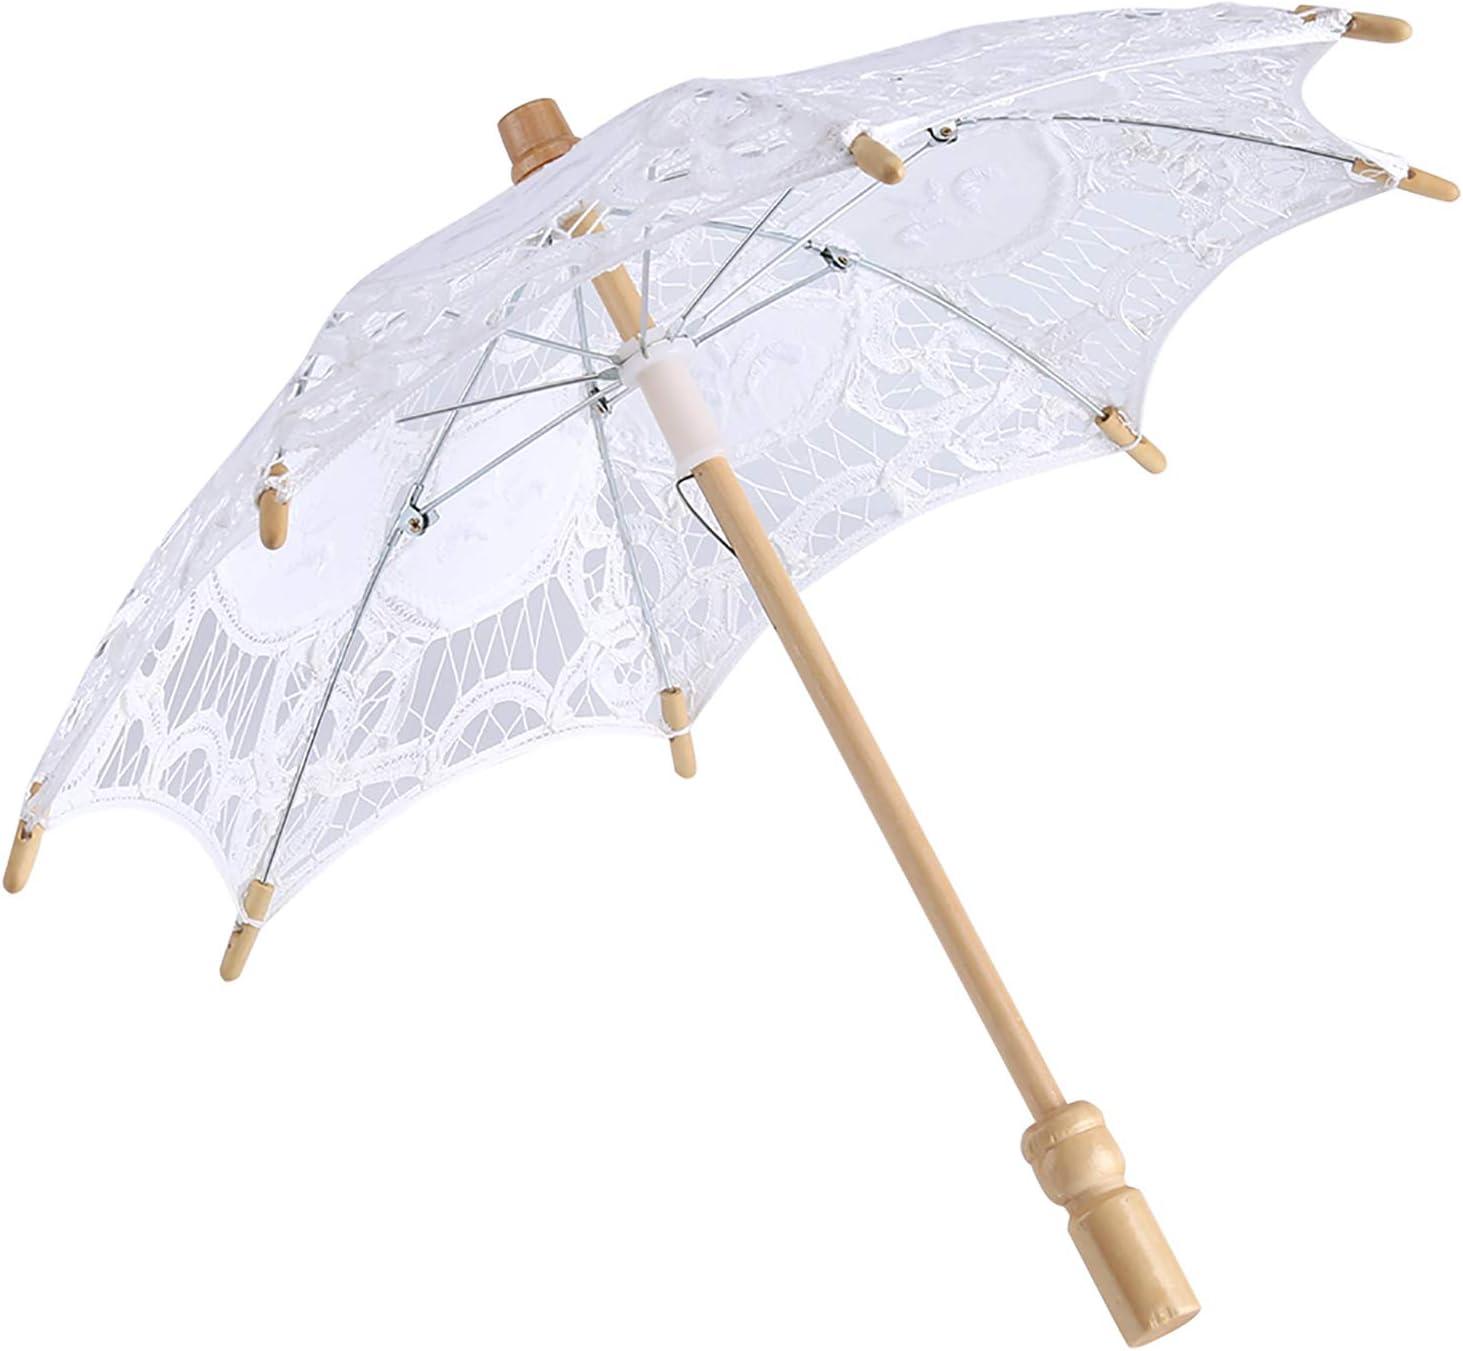 EVTSCAN Vintage Lace Parasol Wedding Max 53% OFF Lady Umbrella Nippon regular agency